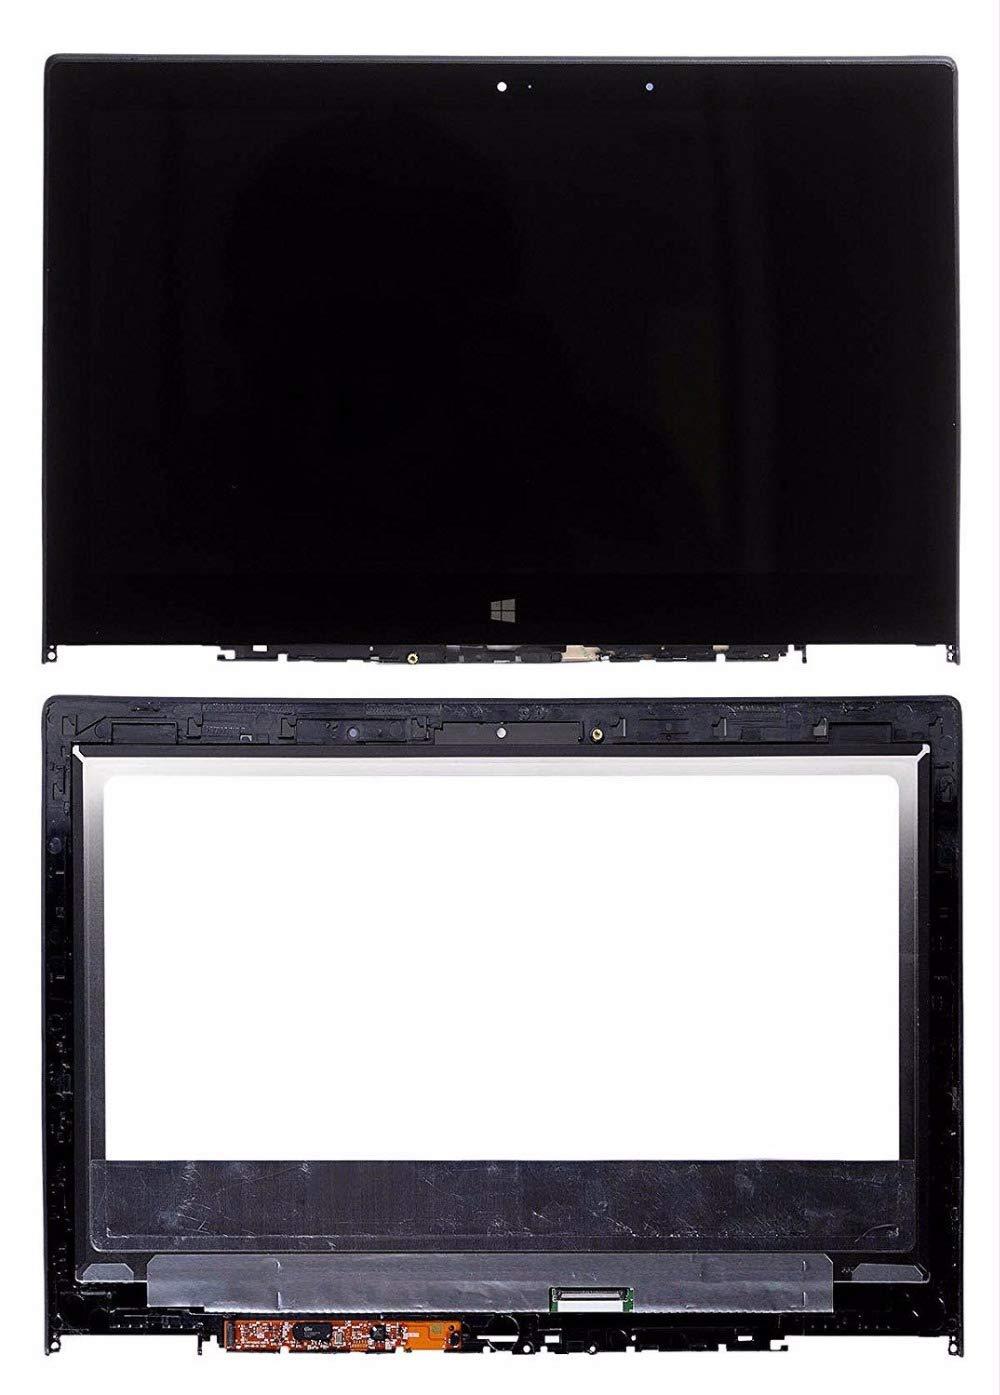 Amazon.com: New for Lenovo Yoga 2 Pro 13 LTN133YL02-L01 LCD ...